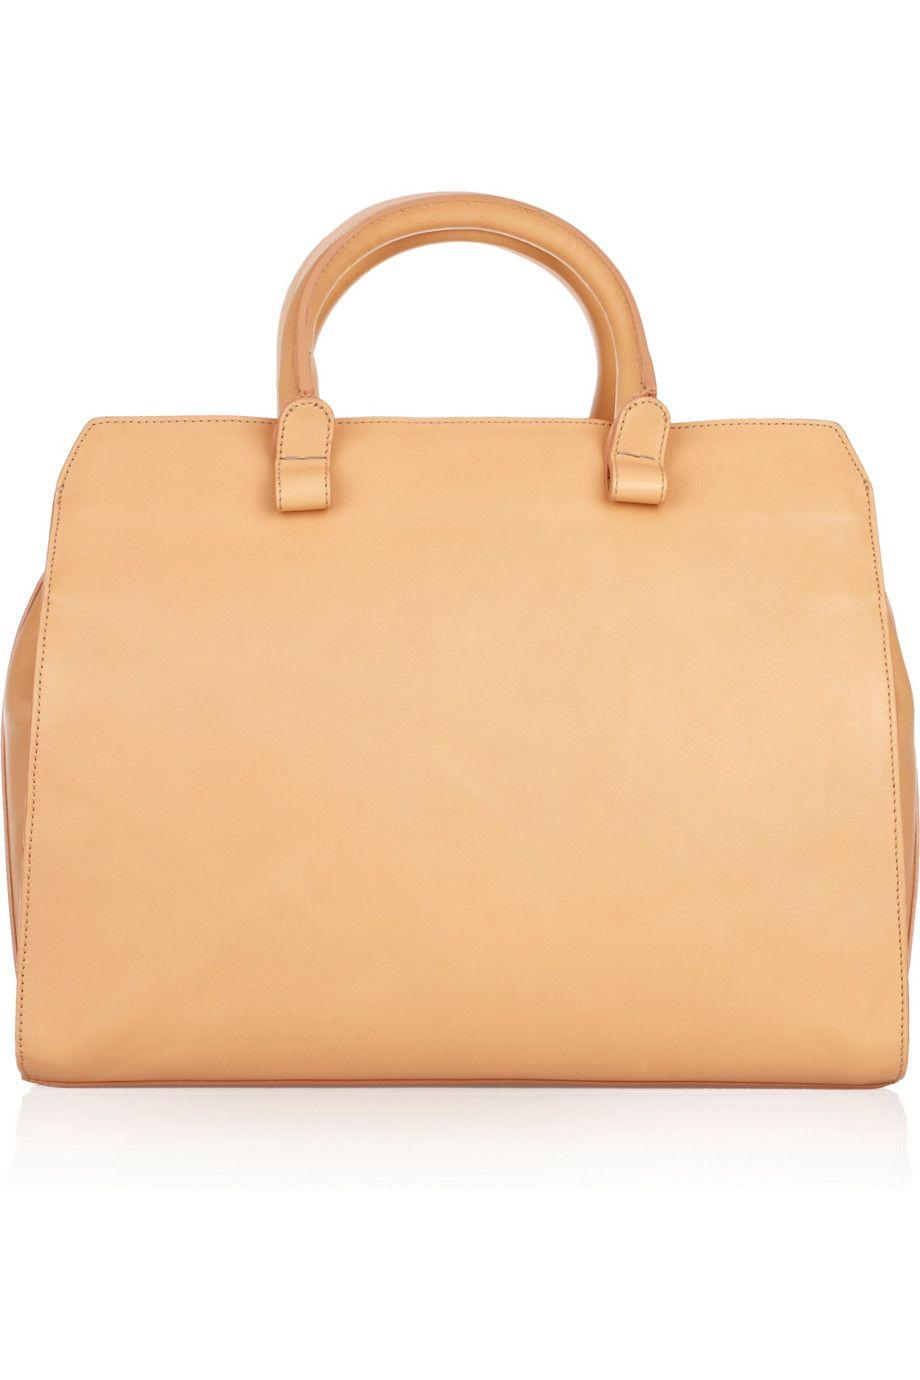 #Victoria #Beckham // the Soft Victoria leather tote 2013